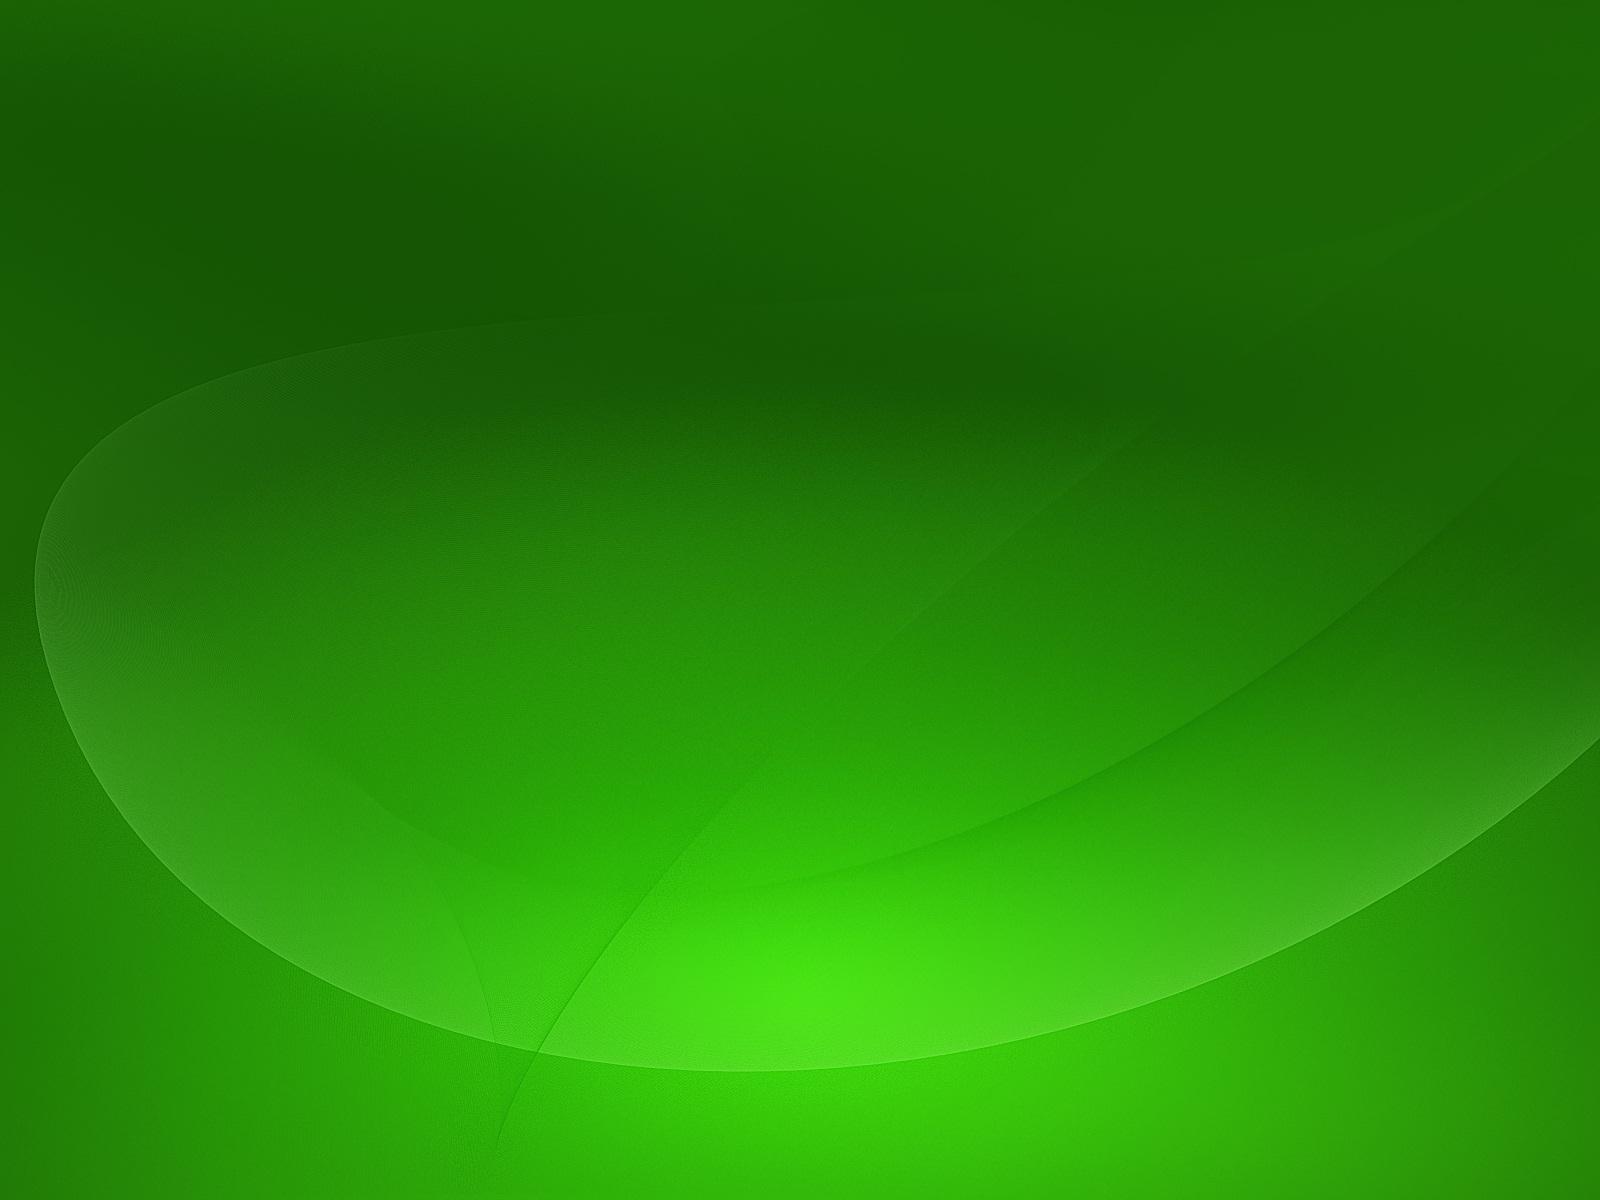 Green Shine без смс